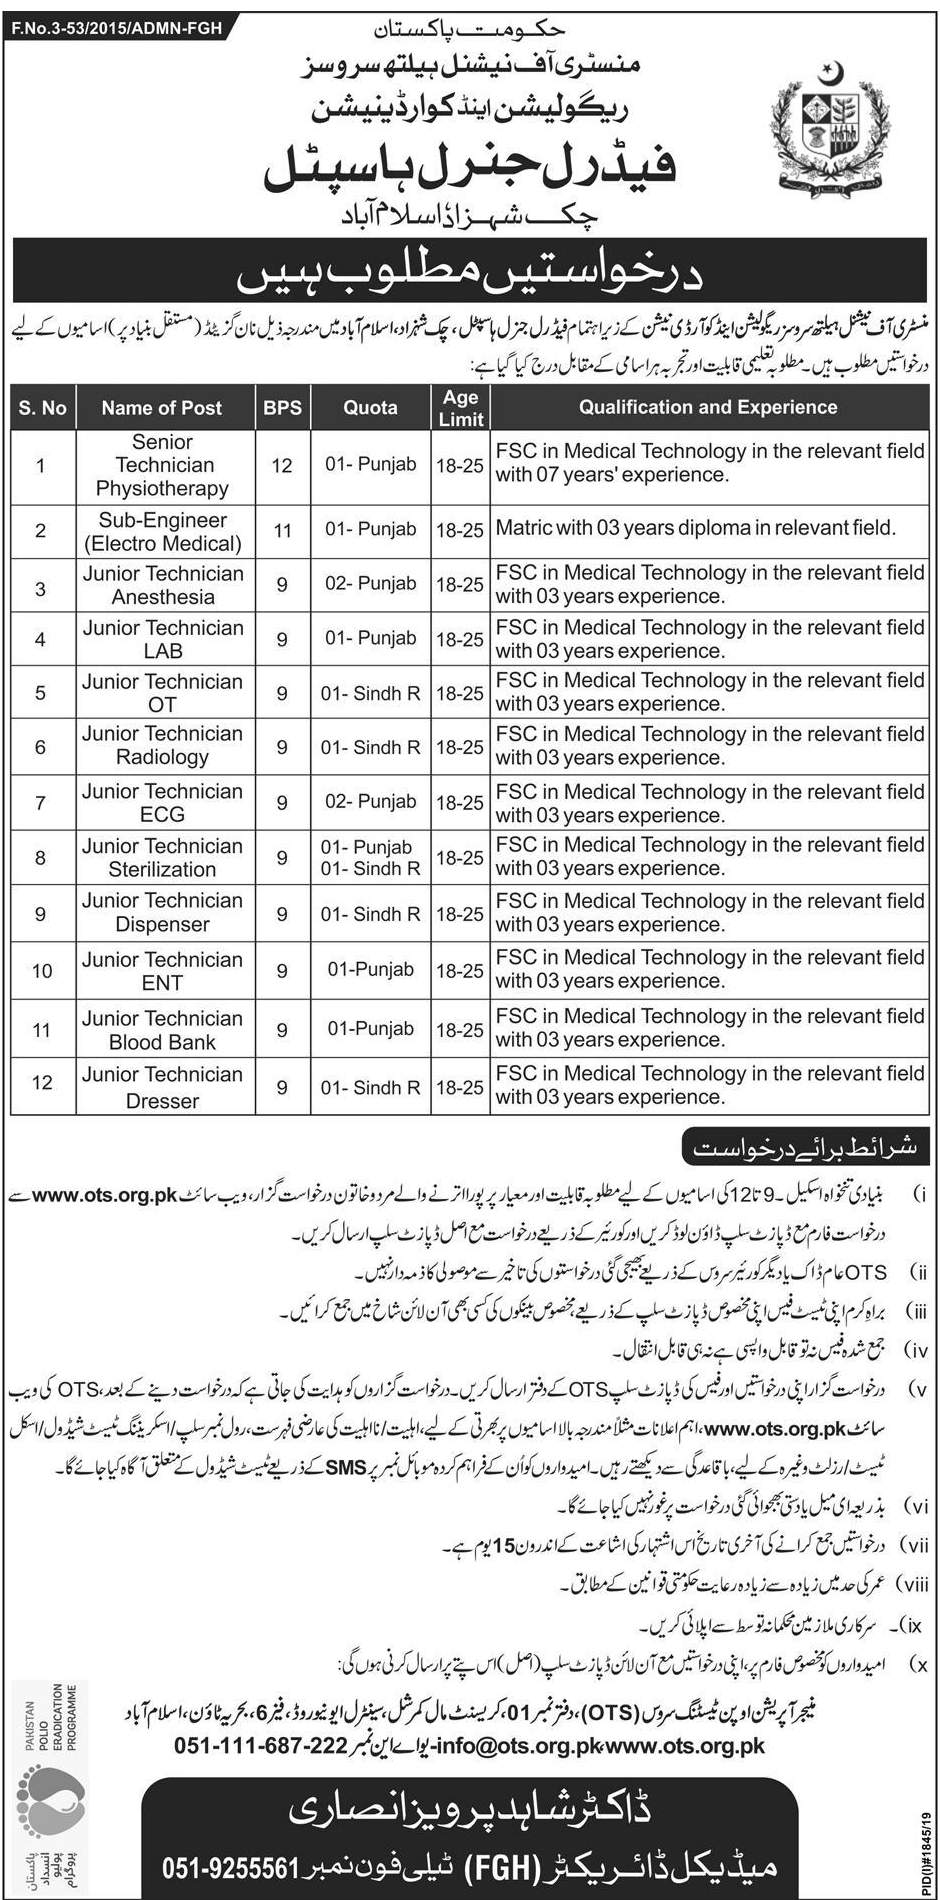 NHSRC Federal General Hospital Chak Shahzad Jobs 2019 OTS Application Form Roll No Slip